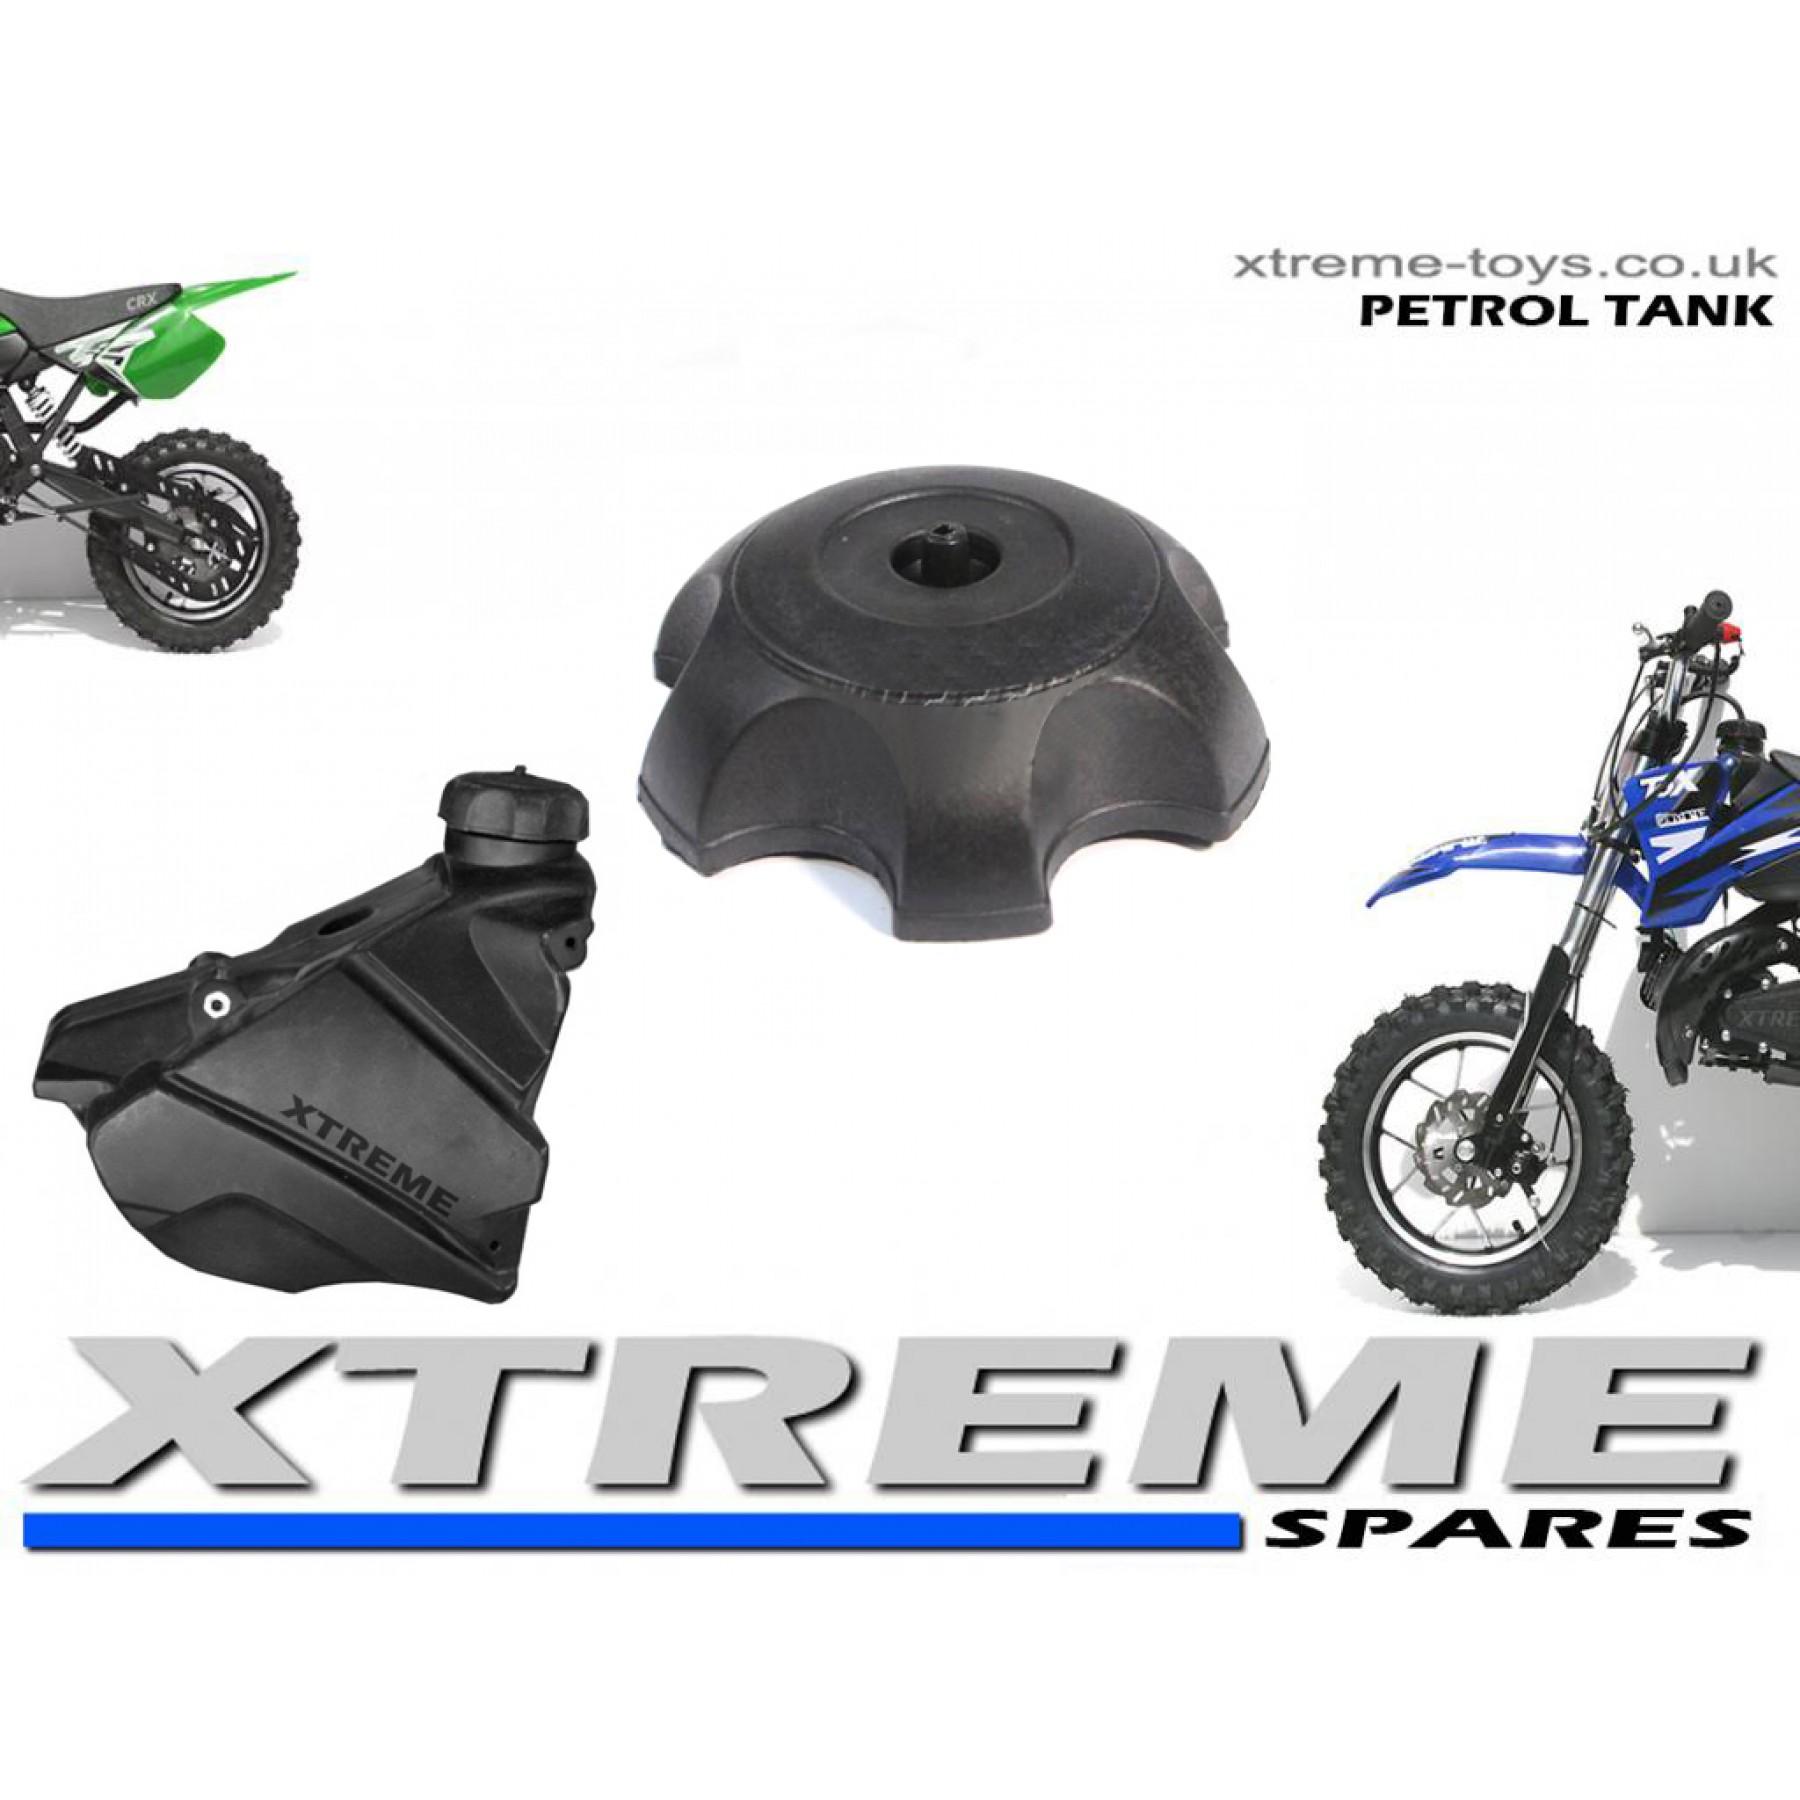 MINI DIRT BIKE/ ATV / QUAD BIKE / MINI MOTO PETROL FUEL TANK CAP 49 - 50CC OFF ROAD